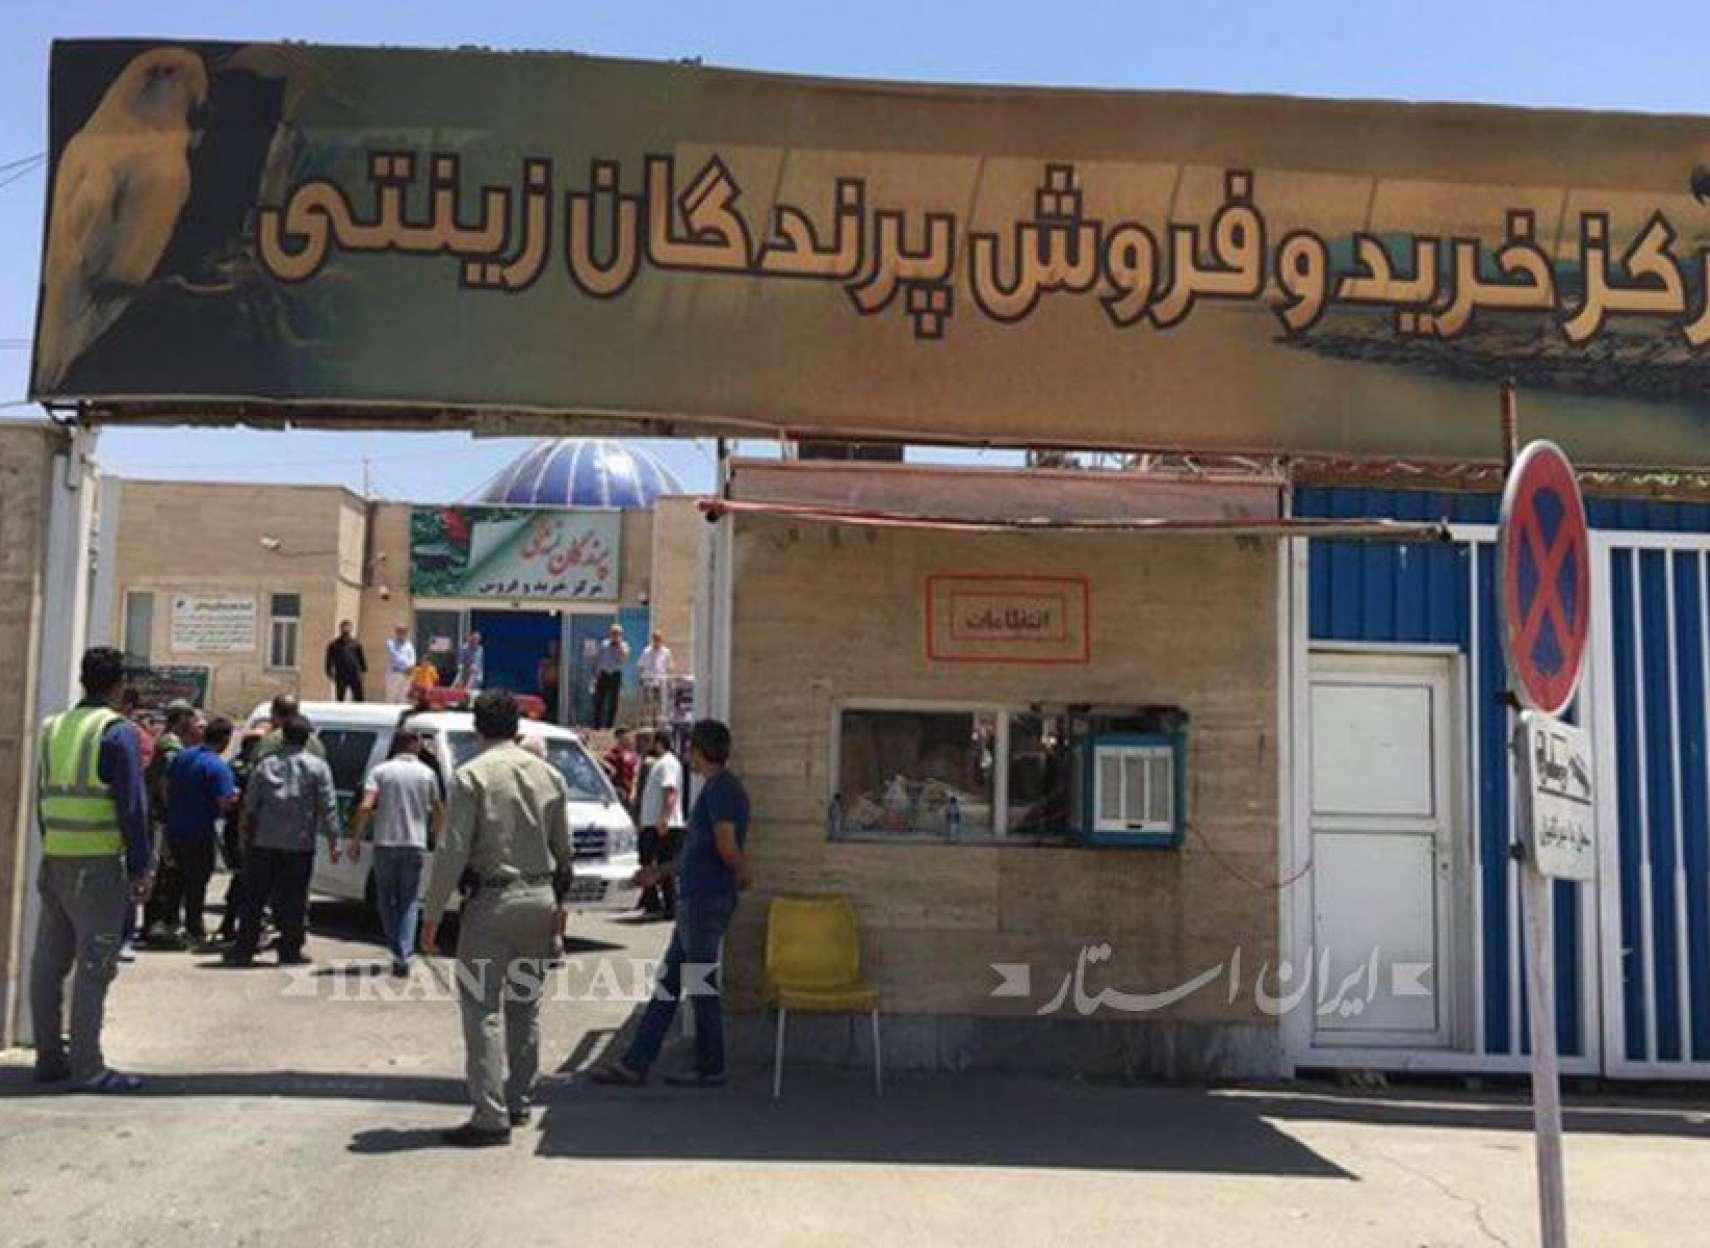 bazaar khalij fars